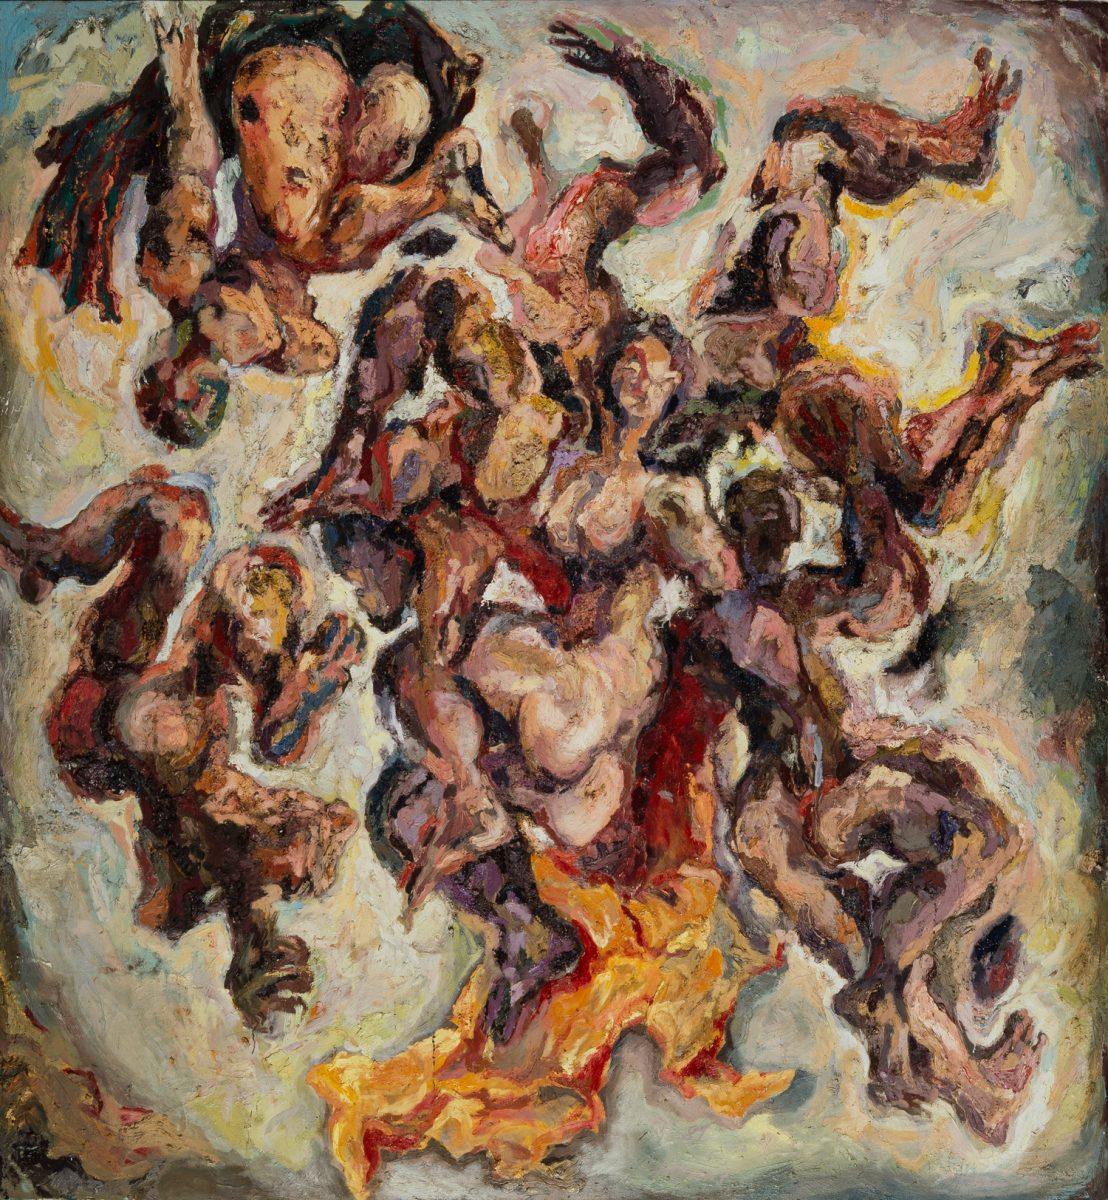 Gatzemeier Höllensturz 1989 Öl auf Leinwand 280 x 260 cm